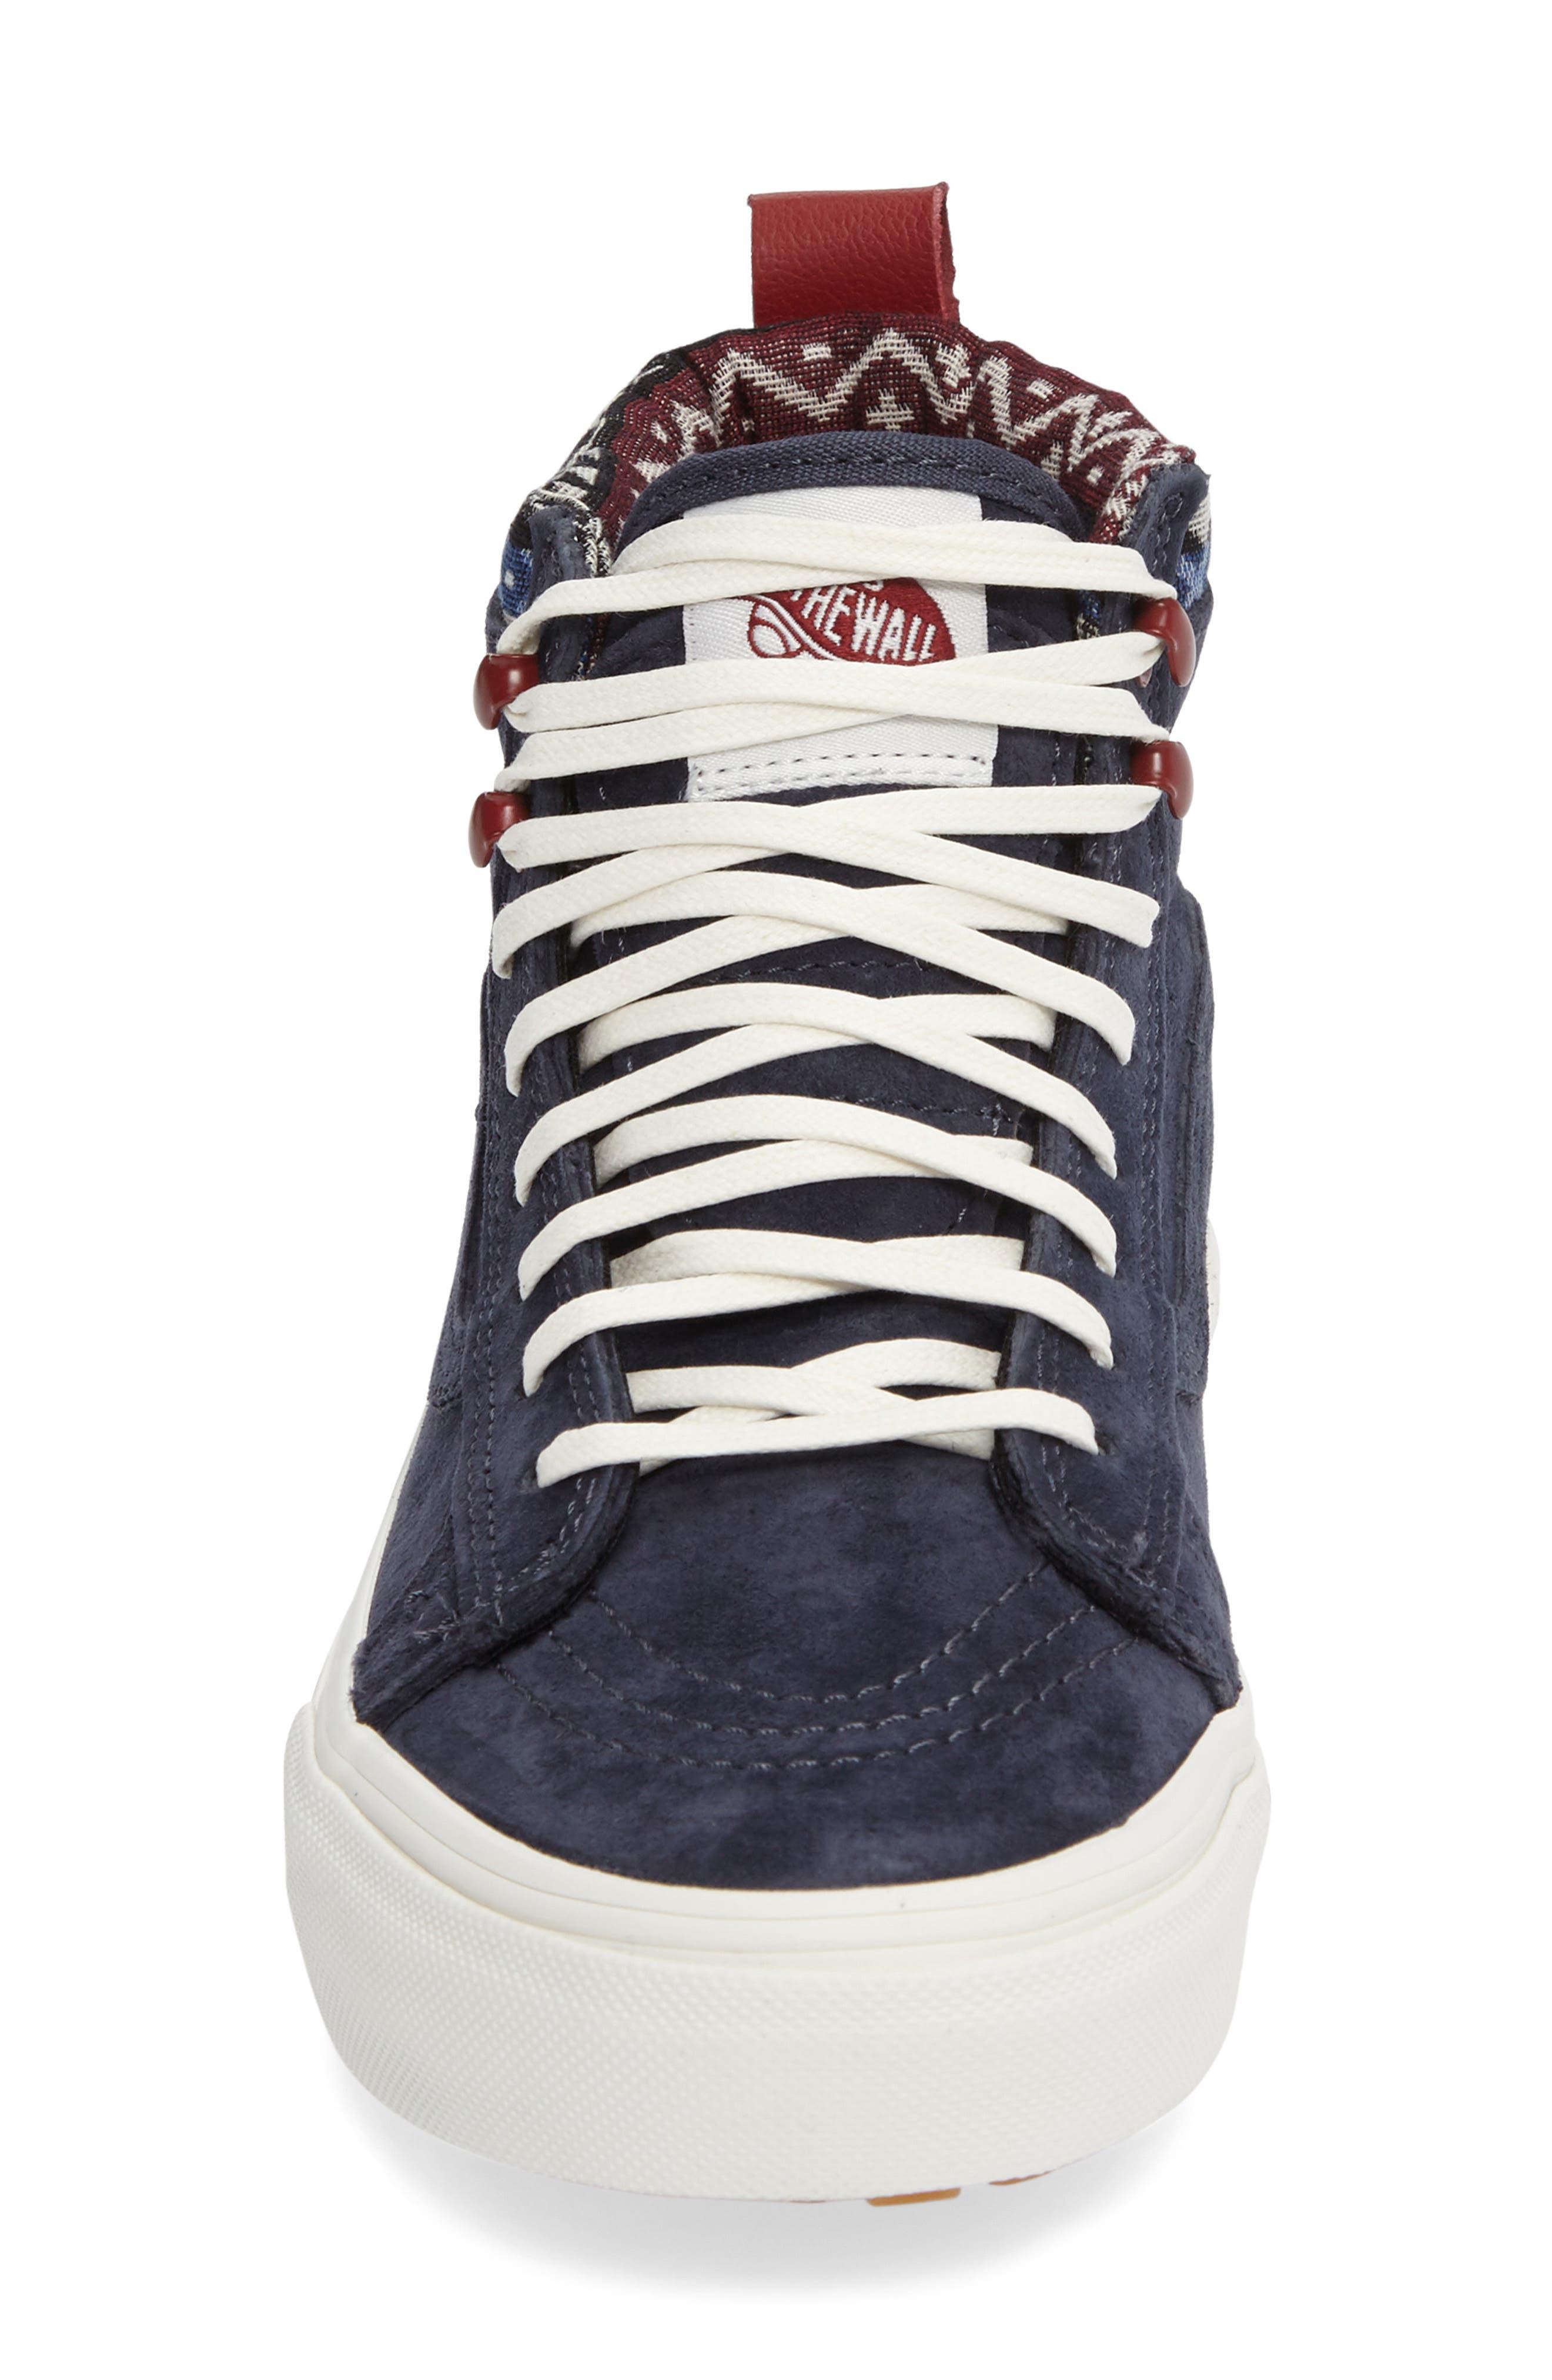 Sk-8 Hi MTE Sneaker,                             Alternate thumbnail 3, color,                             Parisian Night/ Blue Suede